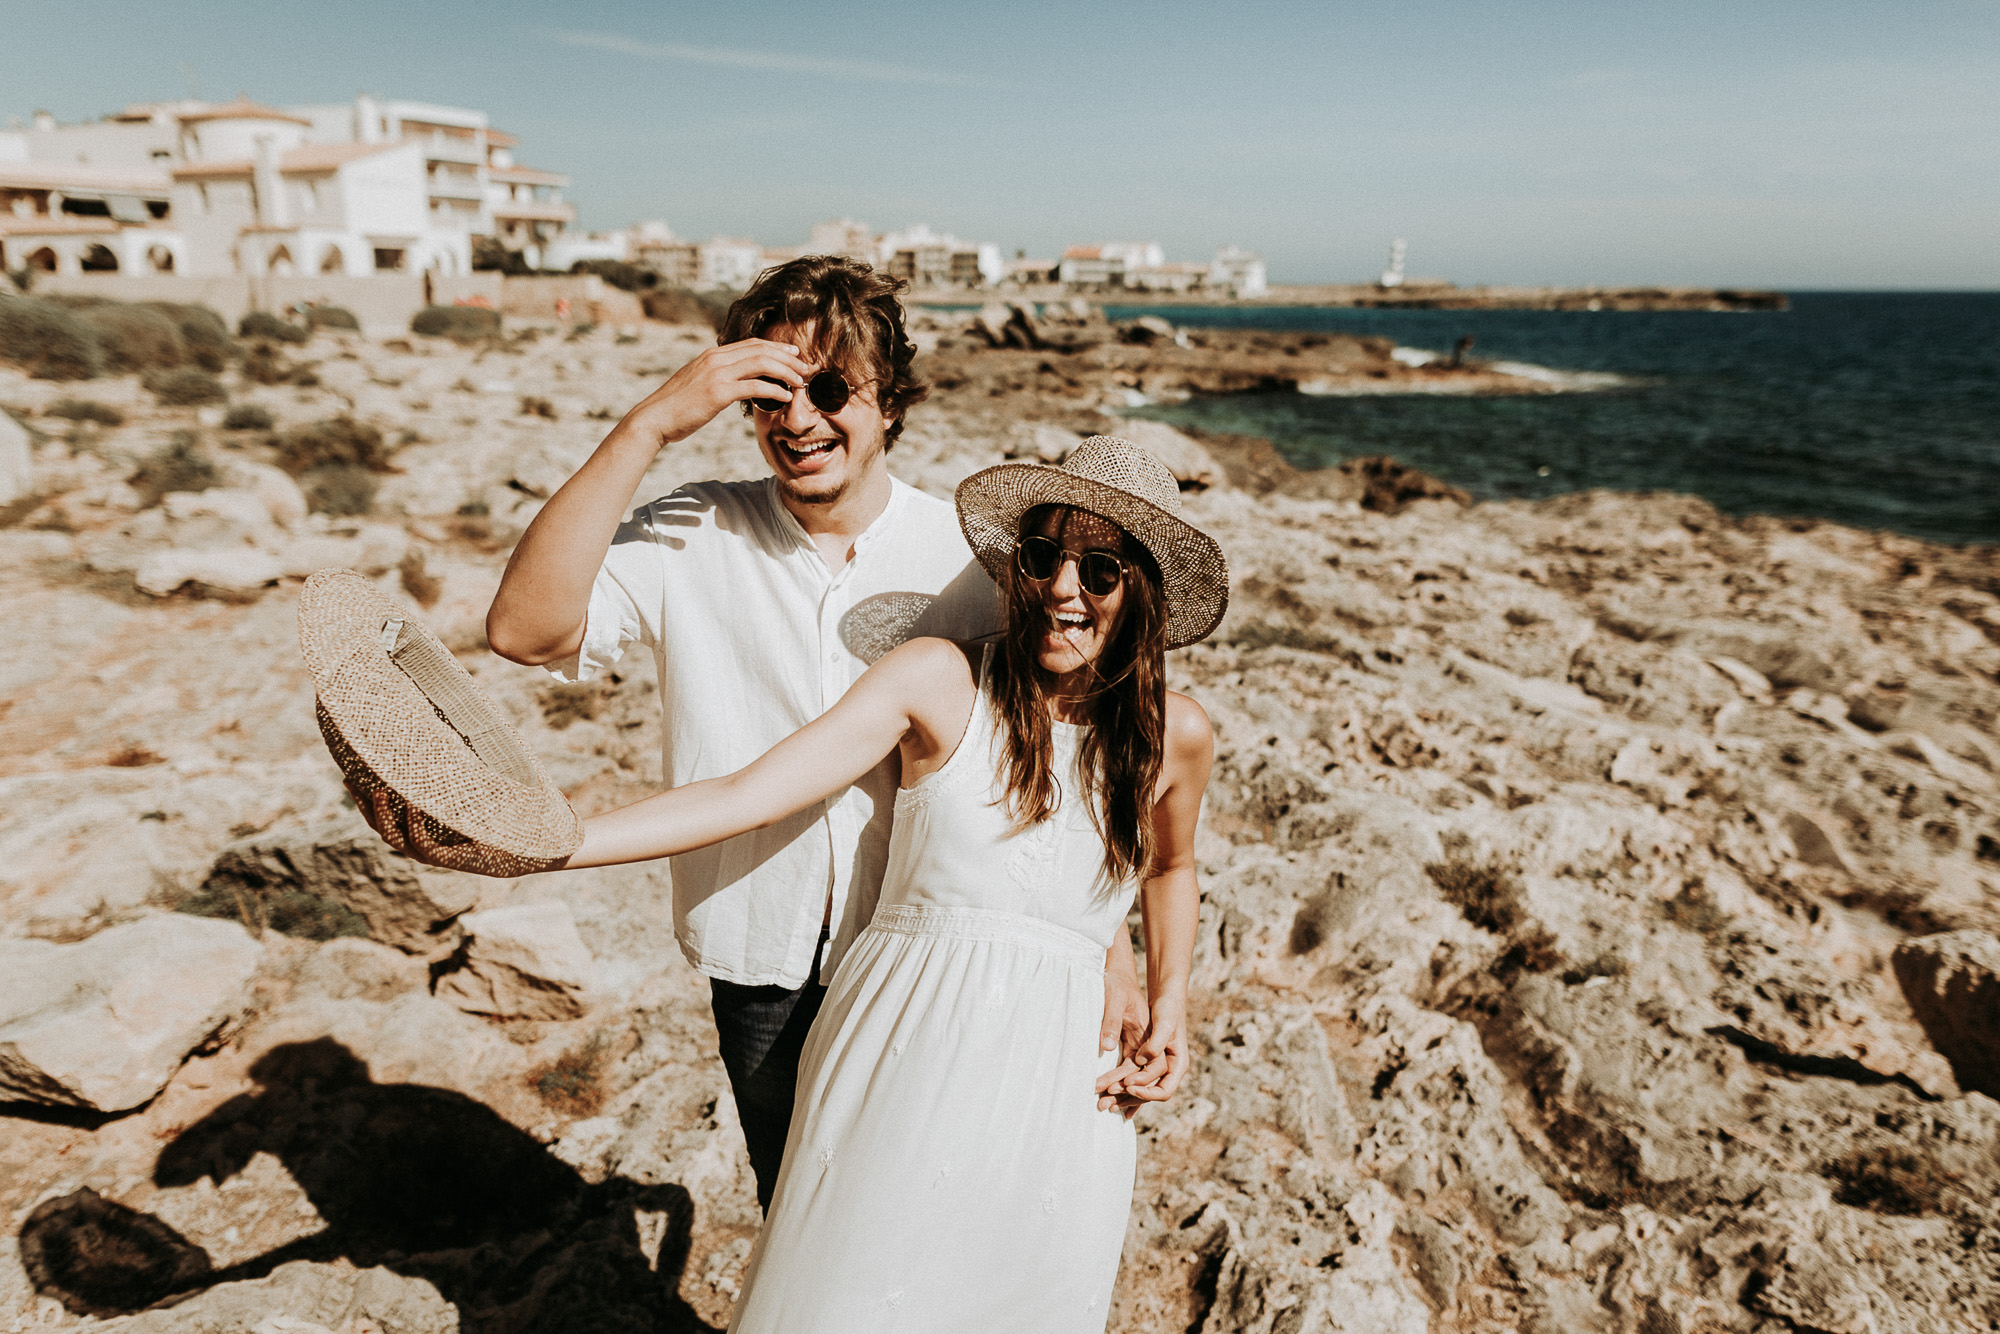 DanielaMarquardtPhotography_wedding_elopement_mallorca_spain_stjordi_sessalines_marinaandxavi335